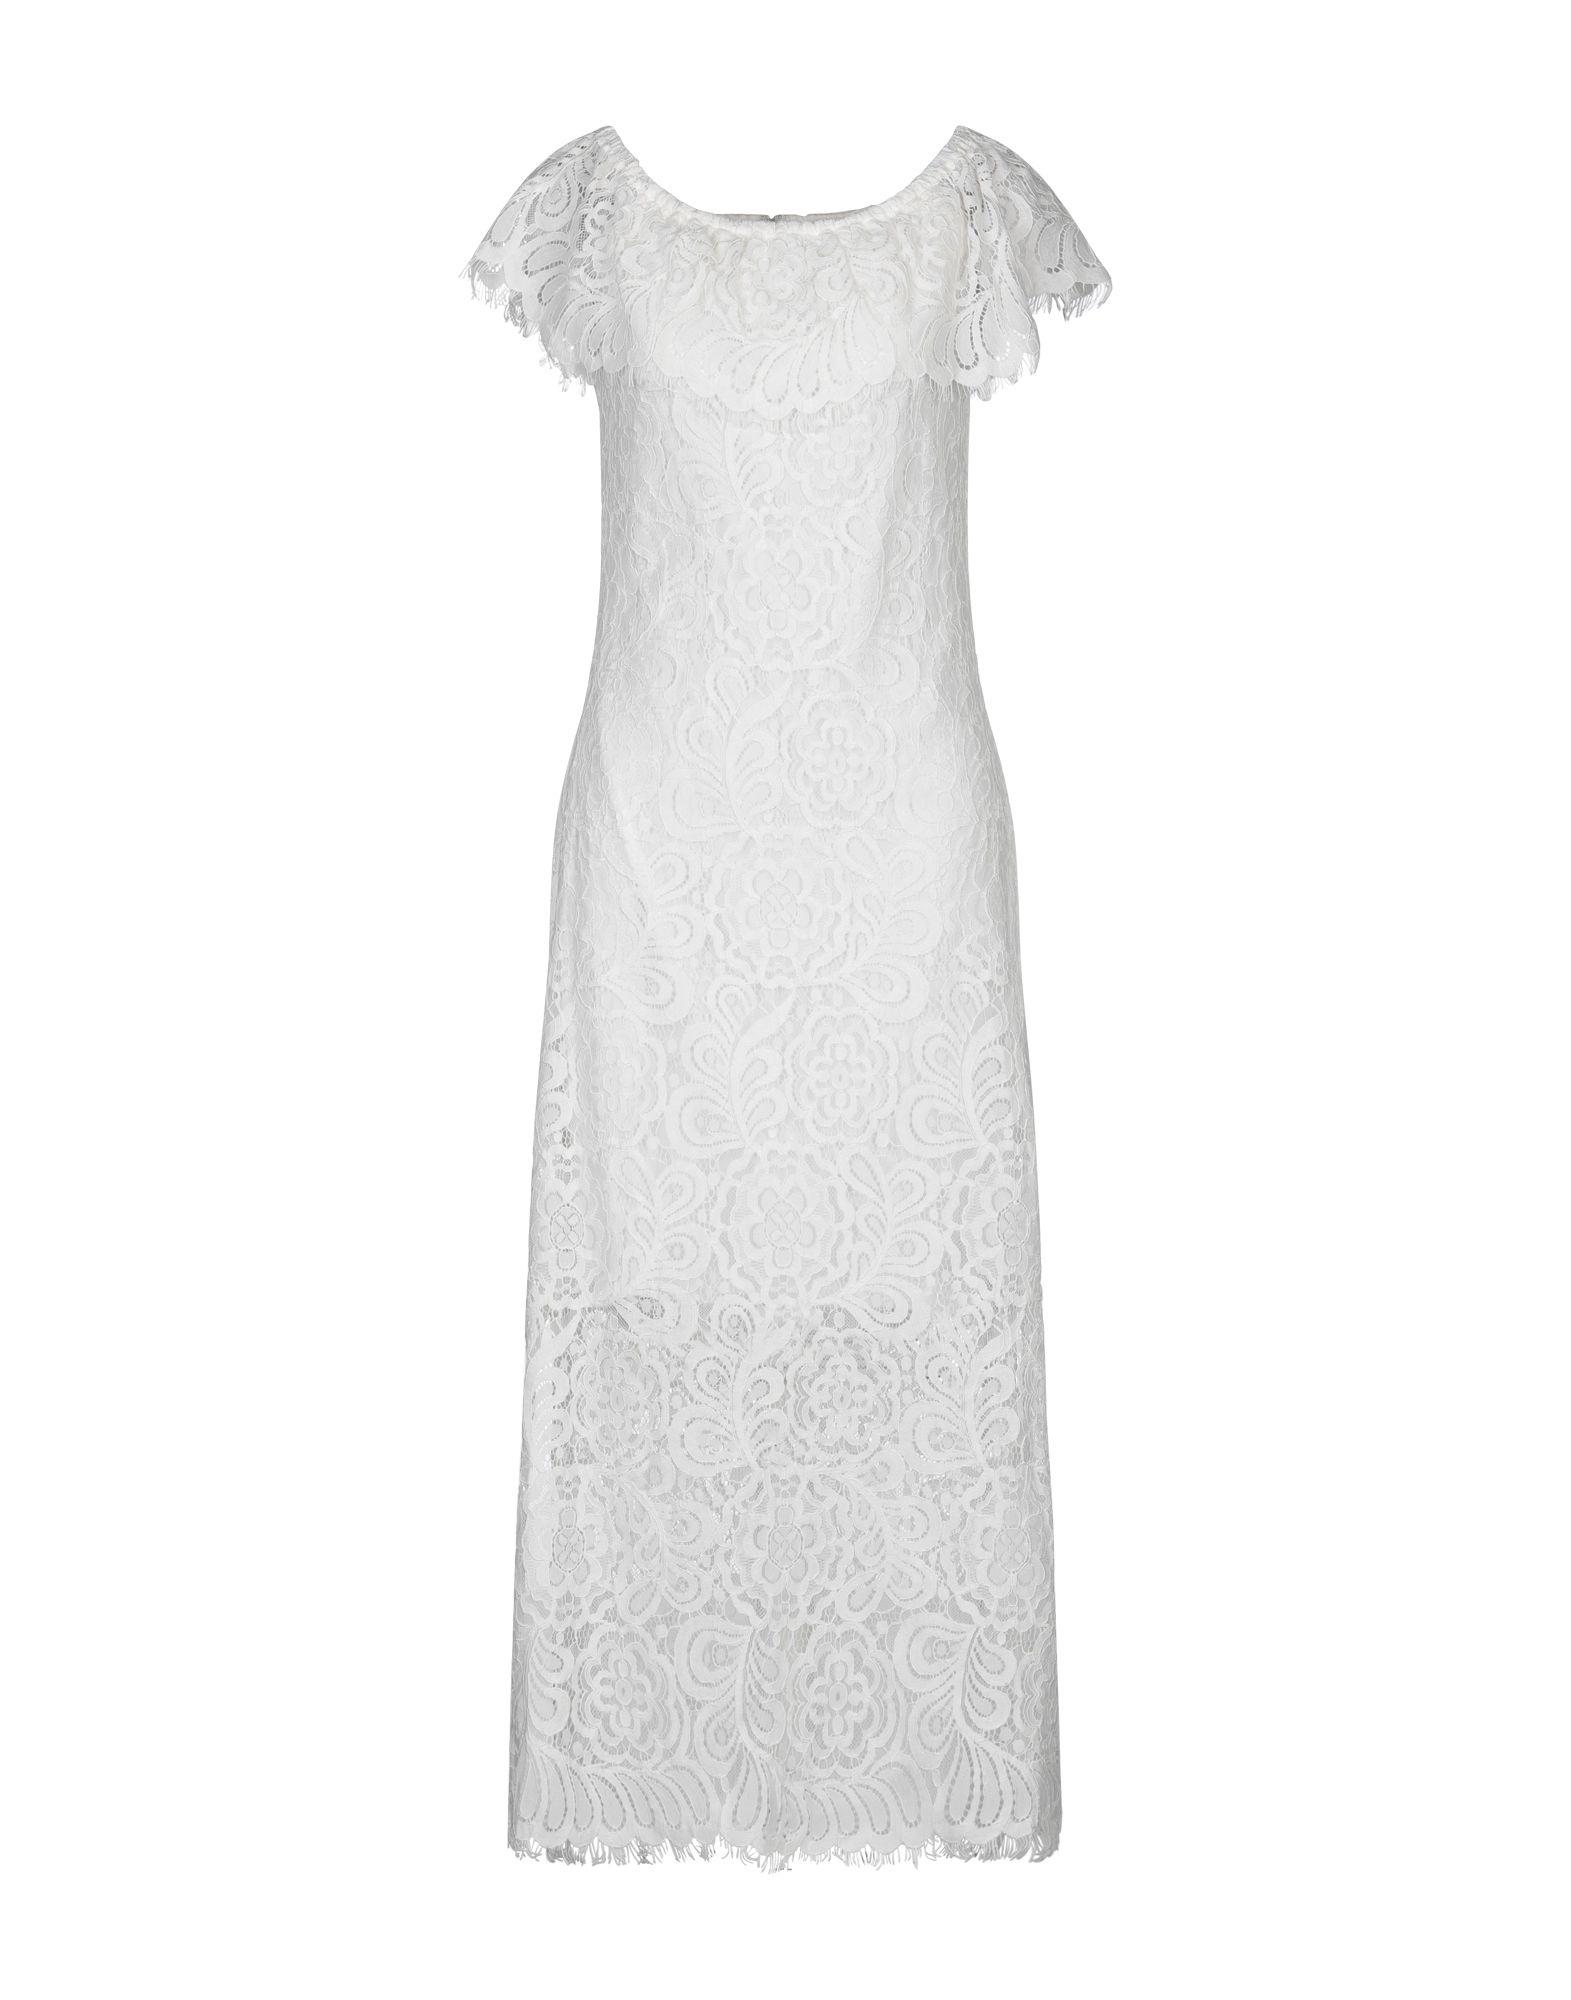 Z.O.E. ZONE OF EMBROIDERED Платье длиной 3/4